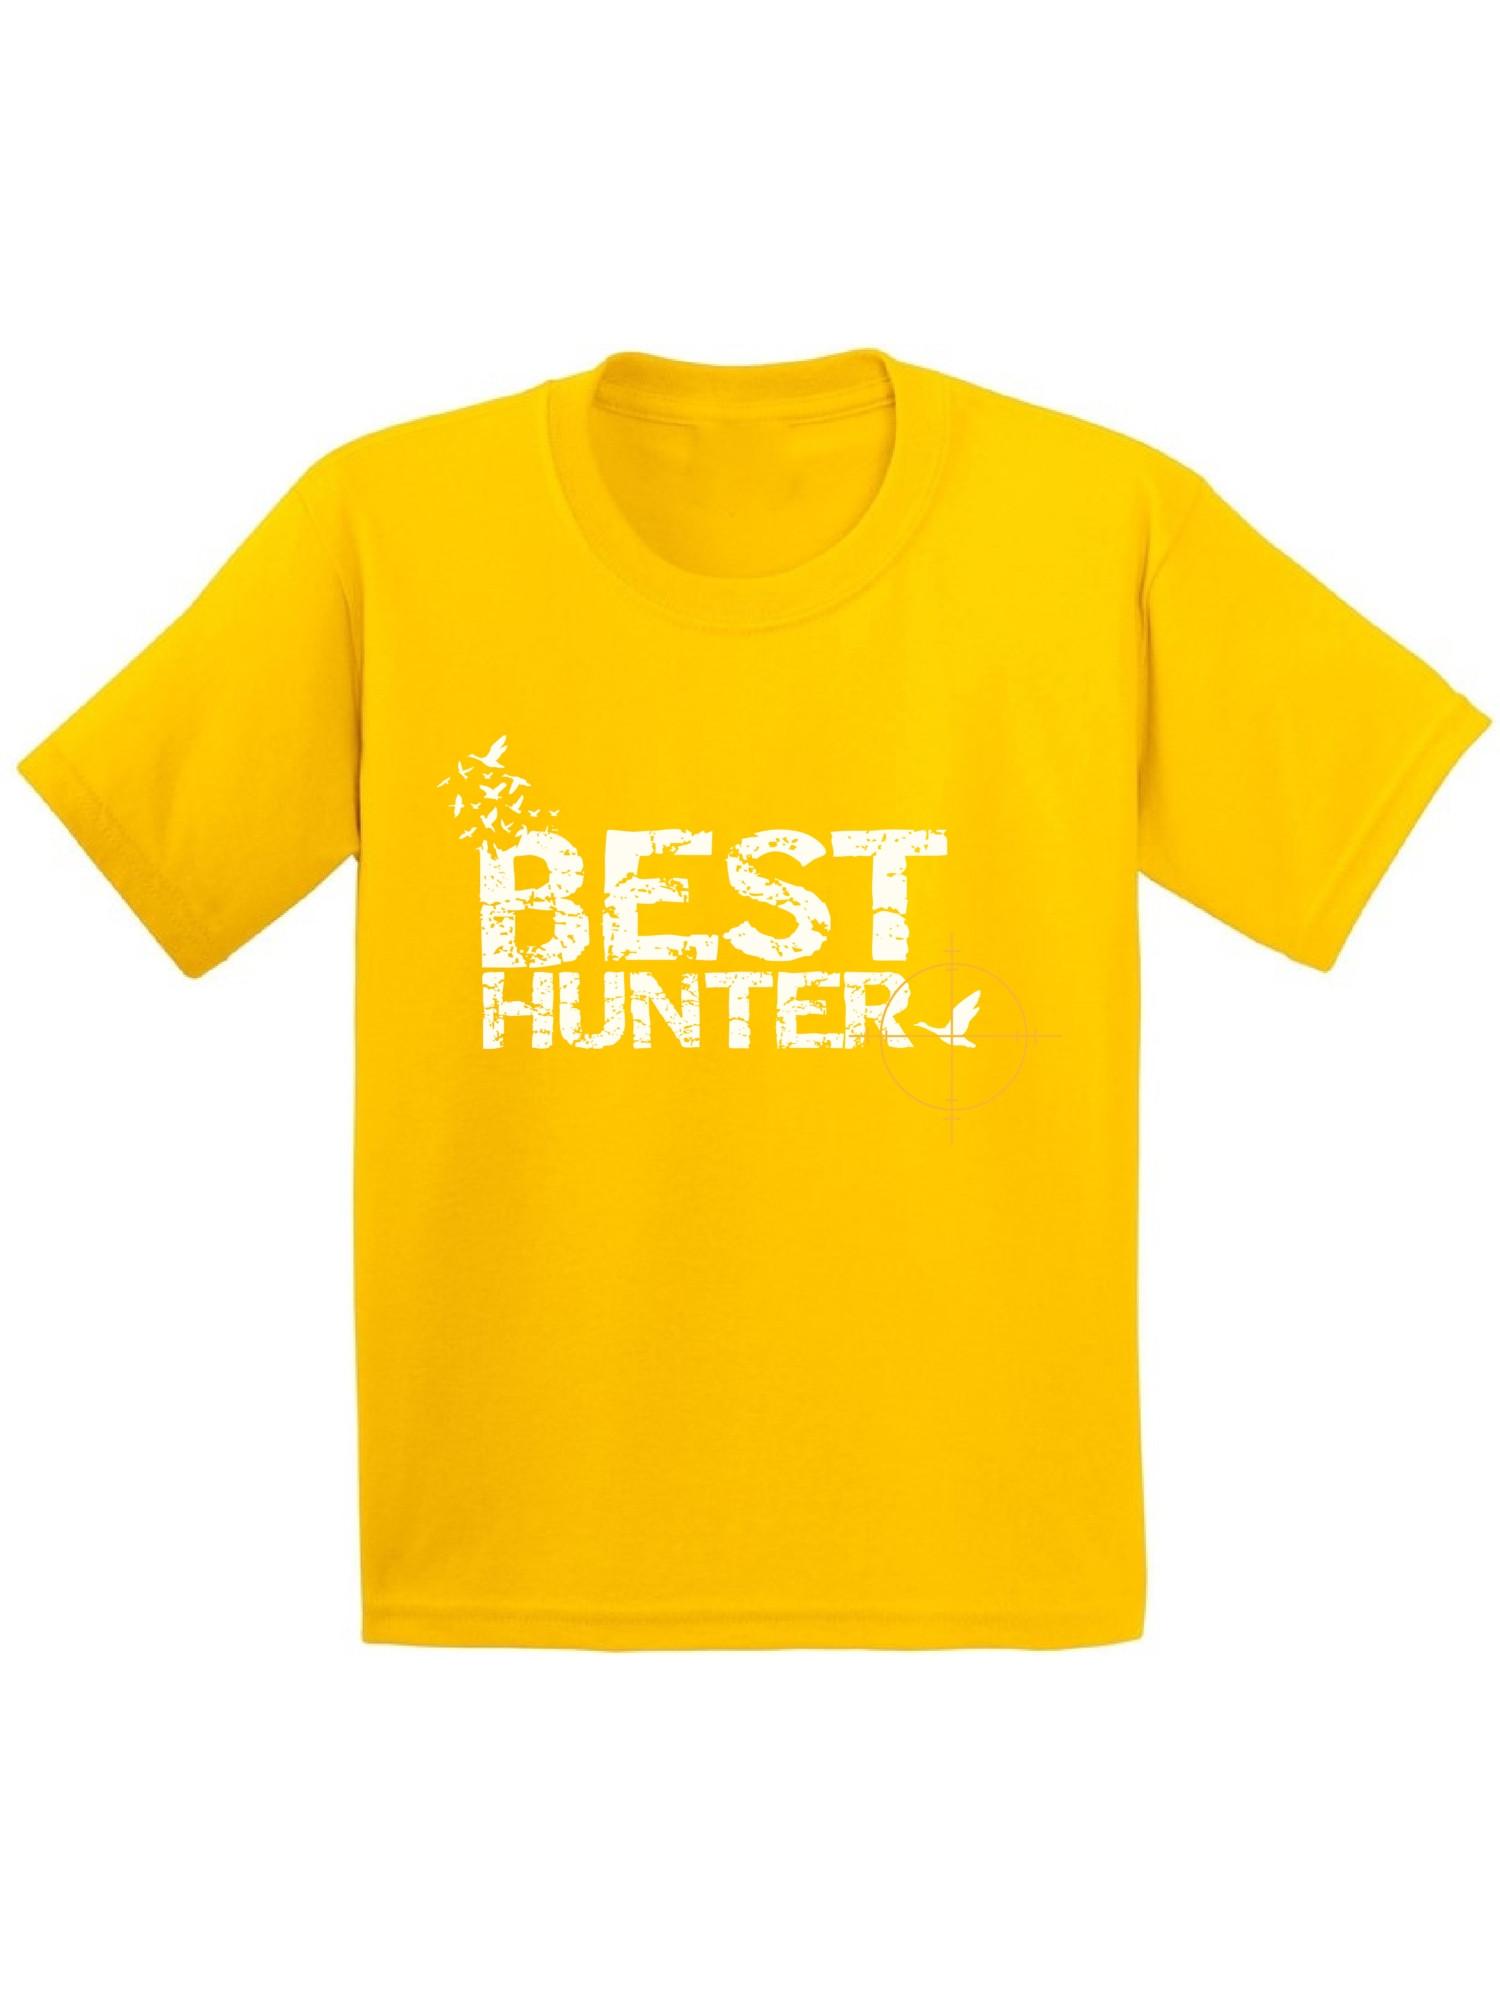 Hunting Gifts For Kids  Awkward Styles Awkward Styles Best Hunter Kids T Shirt